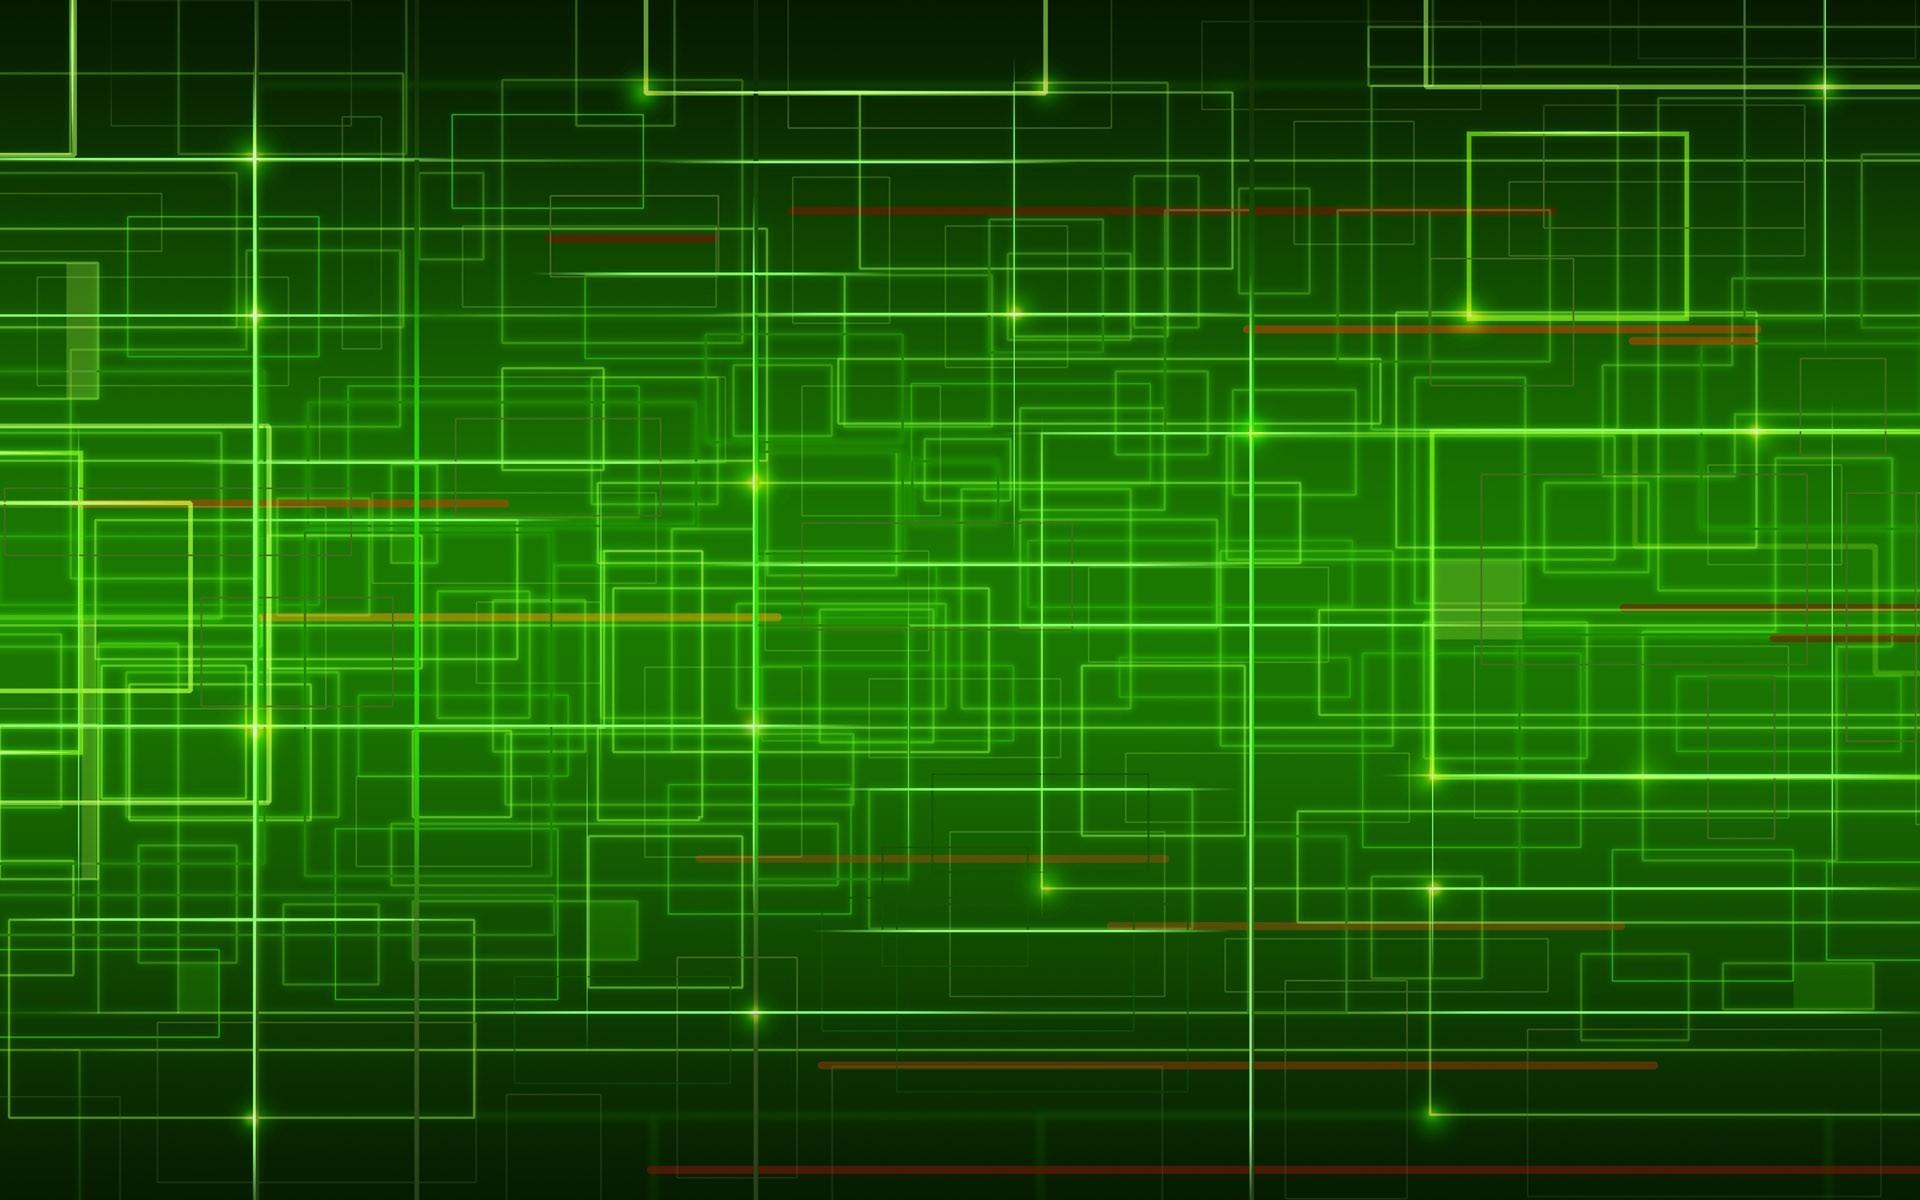 Green Wallpaper 1920x1080 Large Resolution